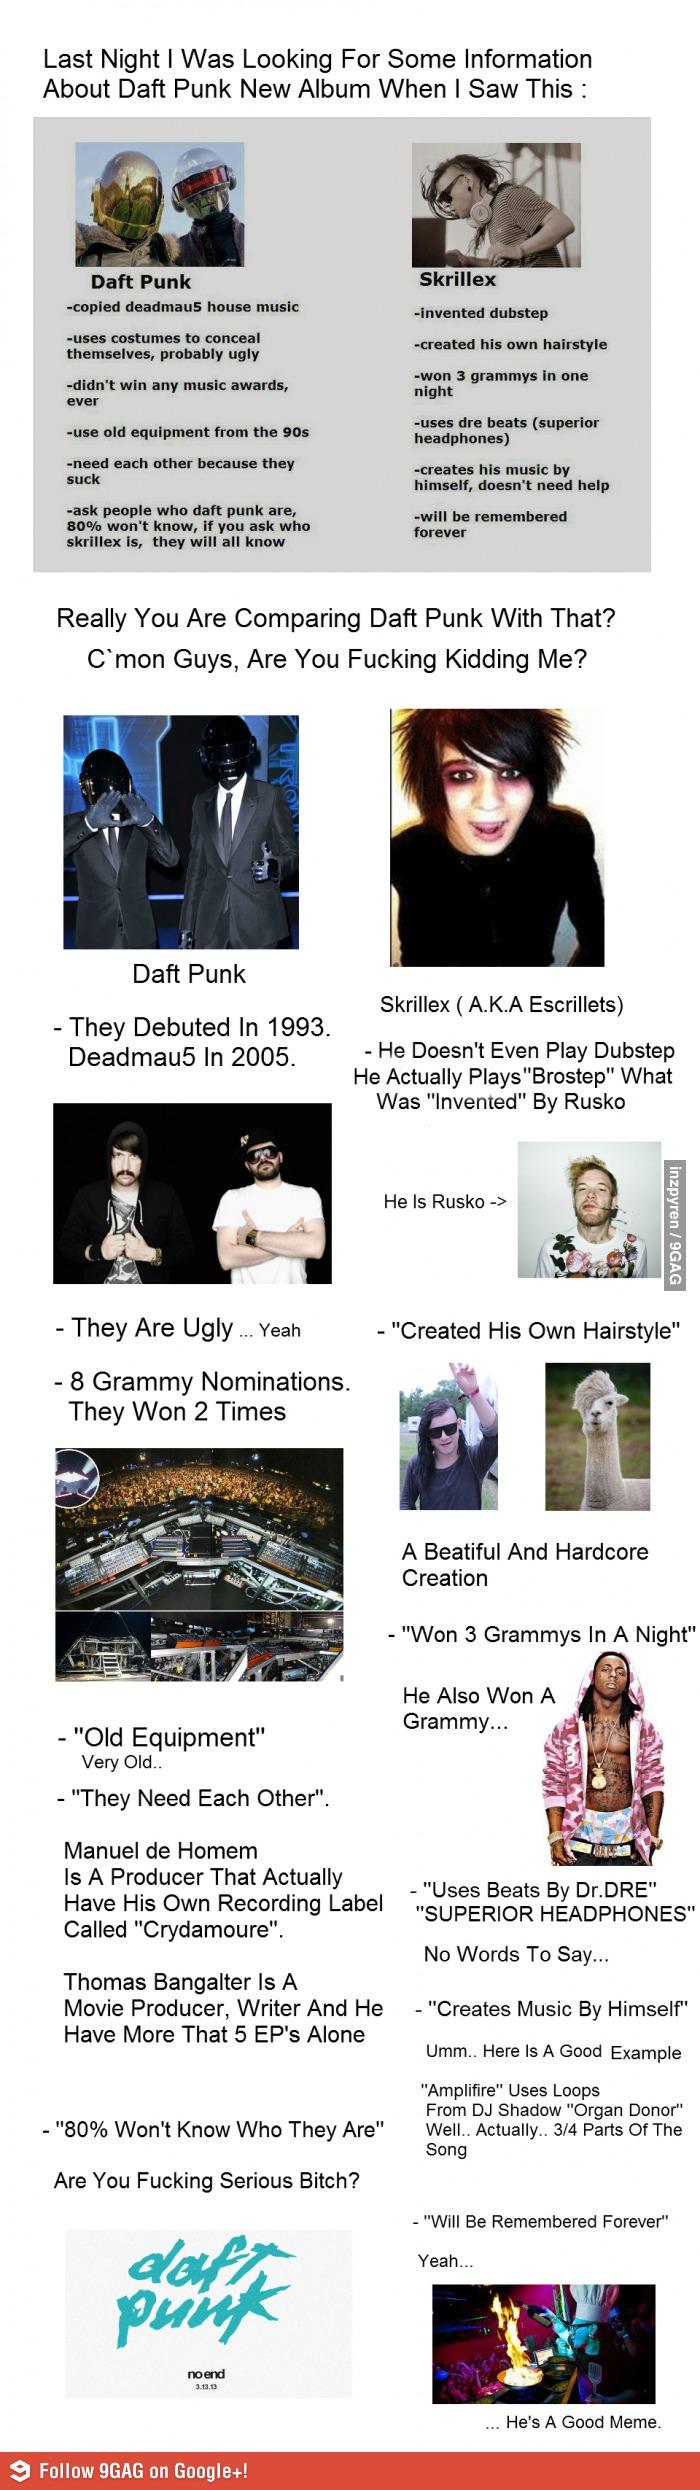 Daft Punk Vs Skrillex Daft punk, Skrillex, Punk